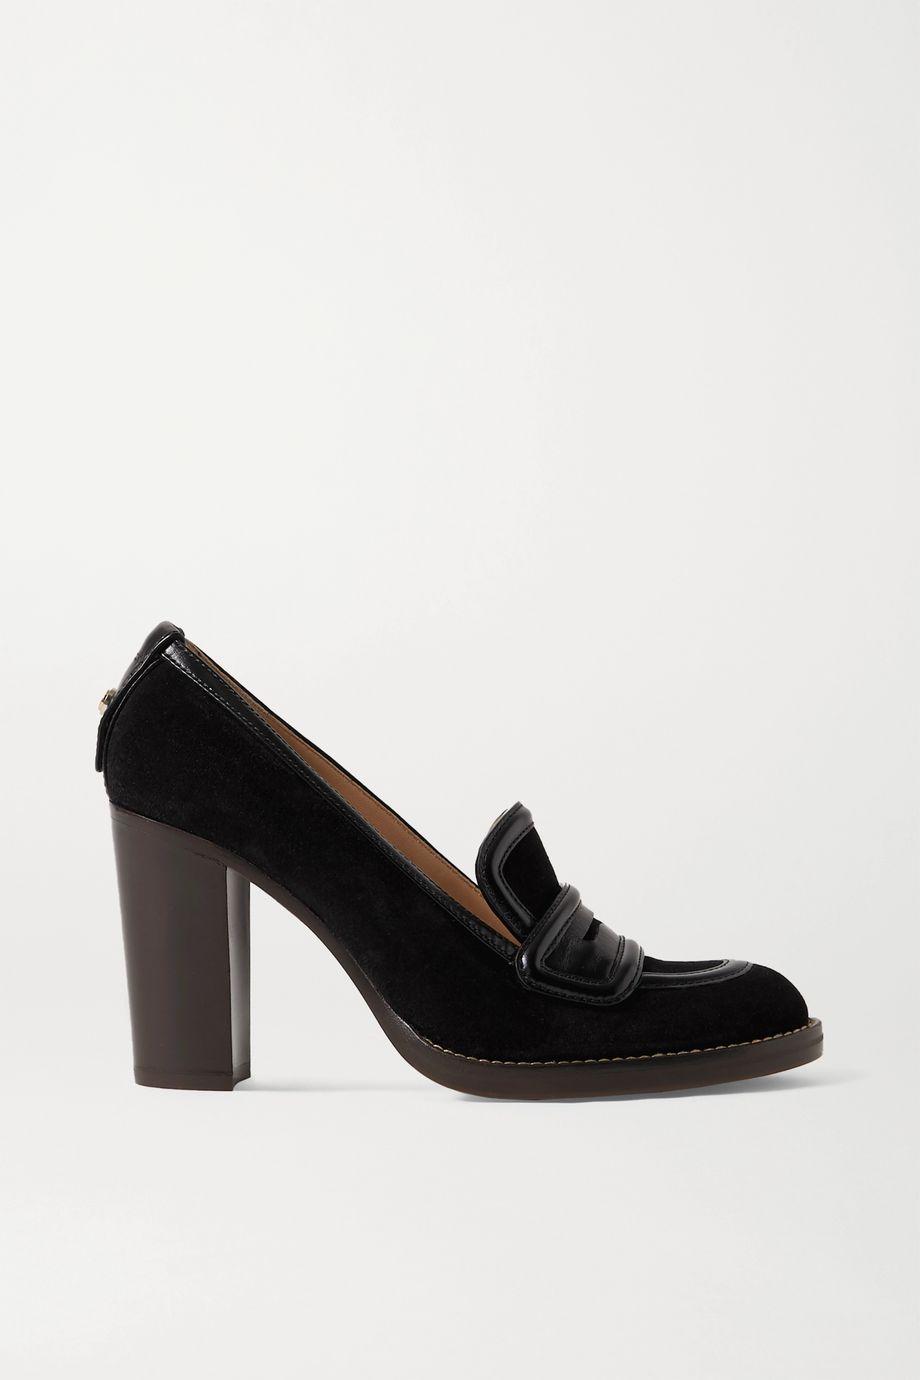 Chloé Emma leather-trimmed suede pumps